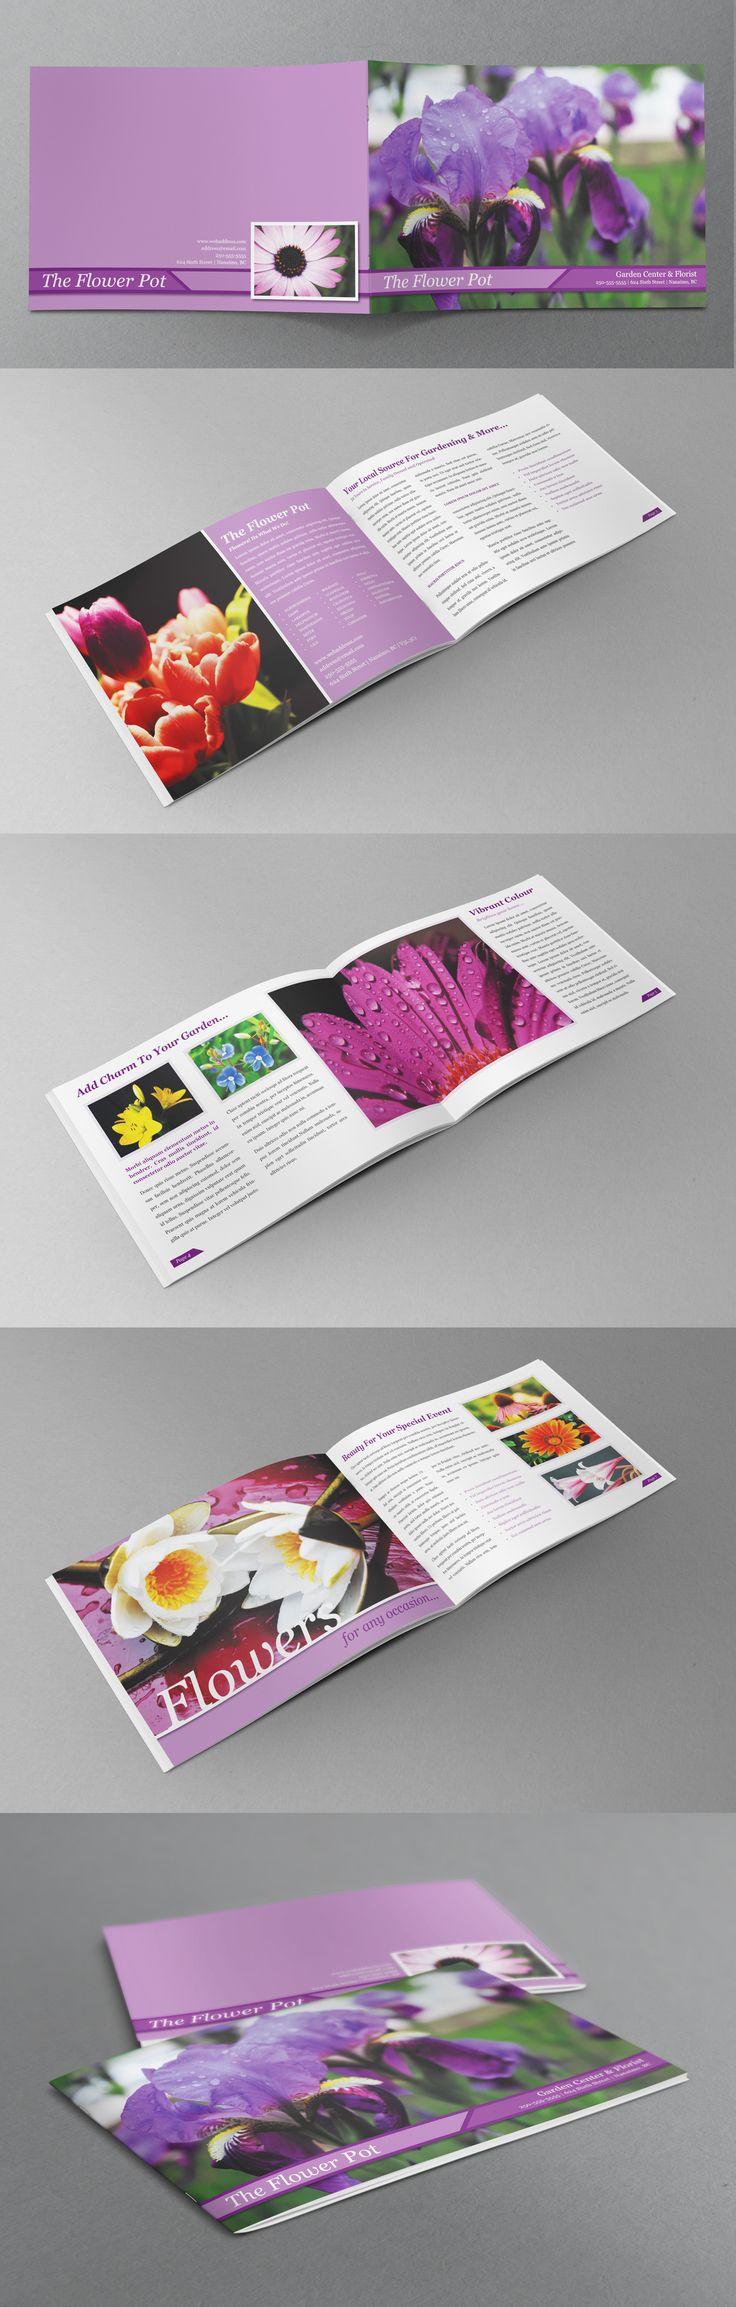 Best 25+ Booklet template ideas on Pinterest